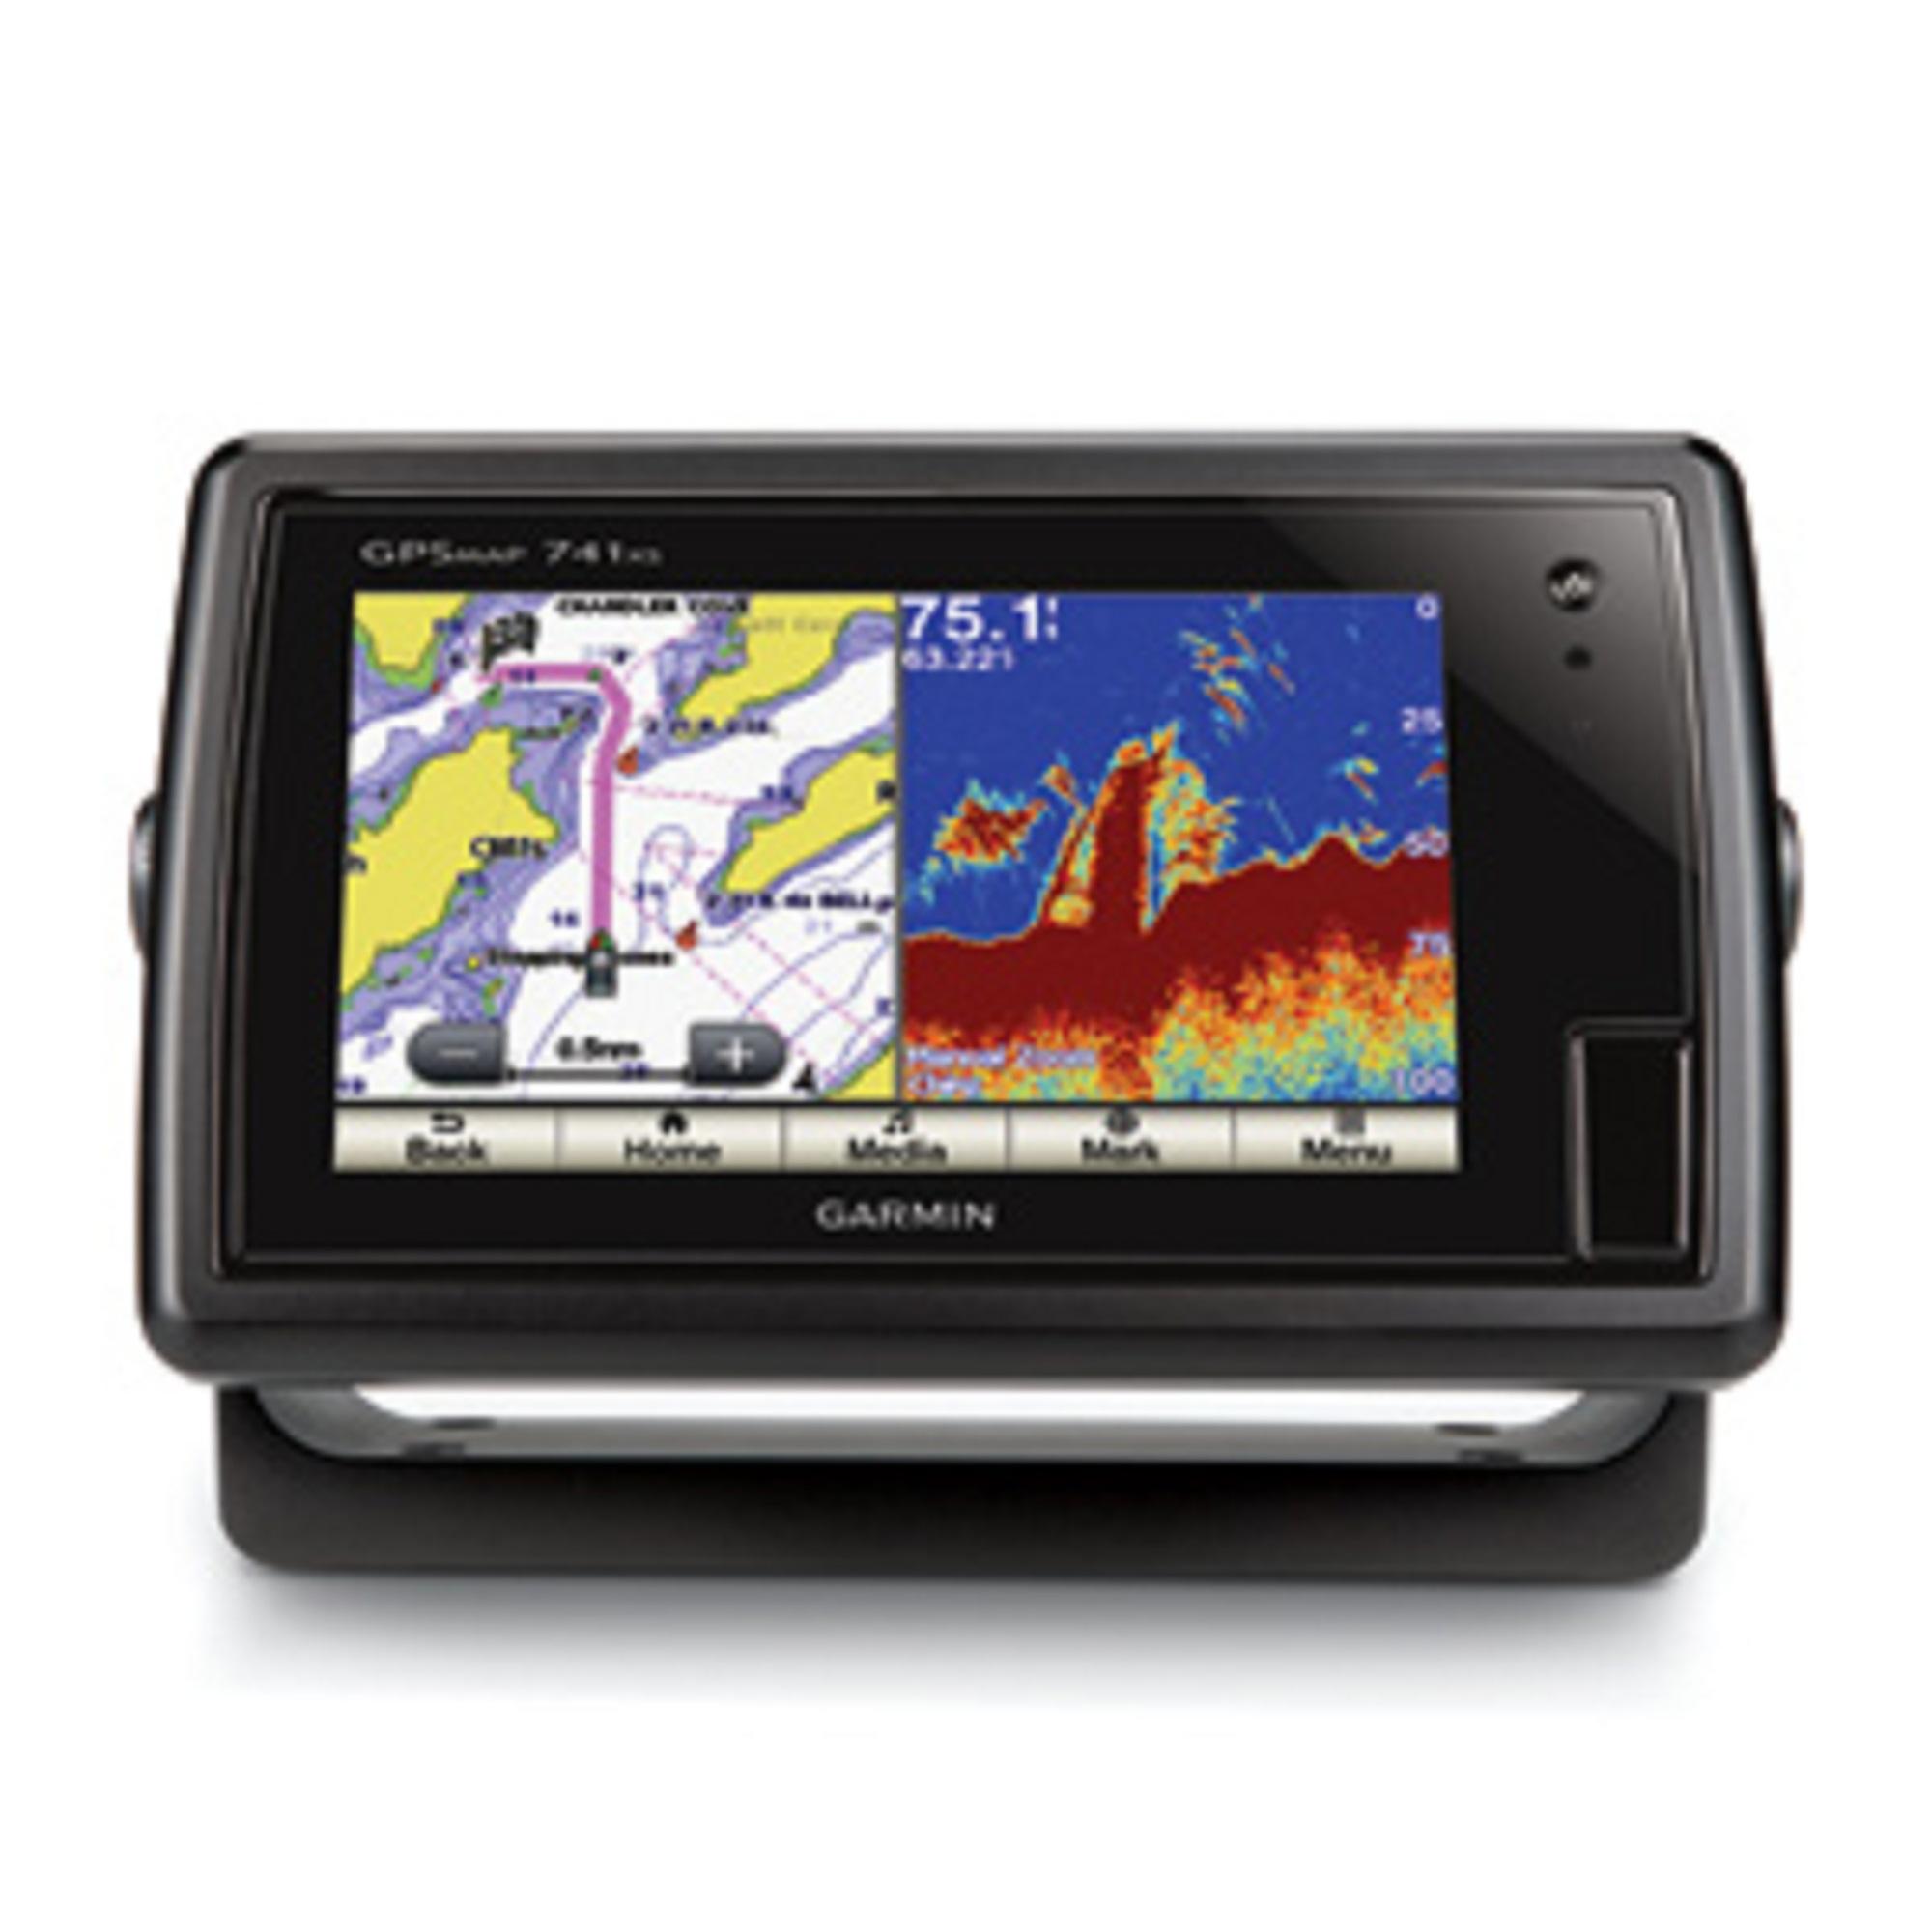 Garmin gpsmap 741xs chartplotter sonar touchscreen combo for Academy fish finder